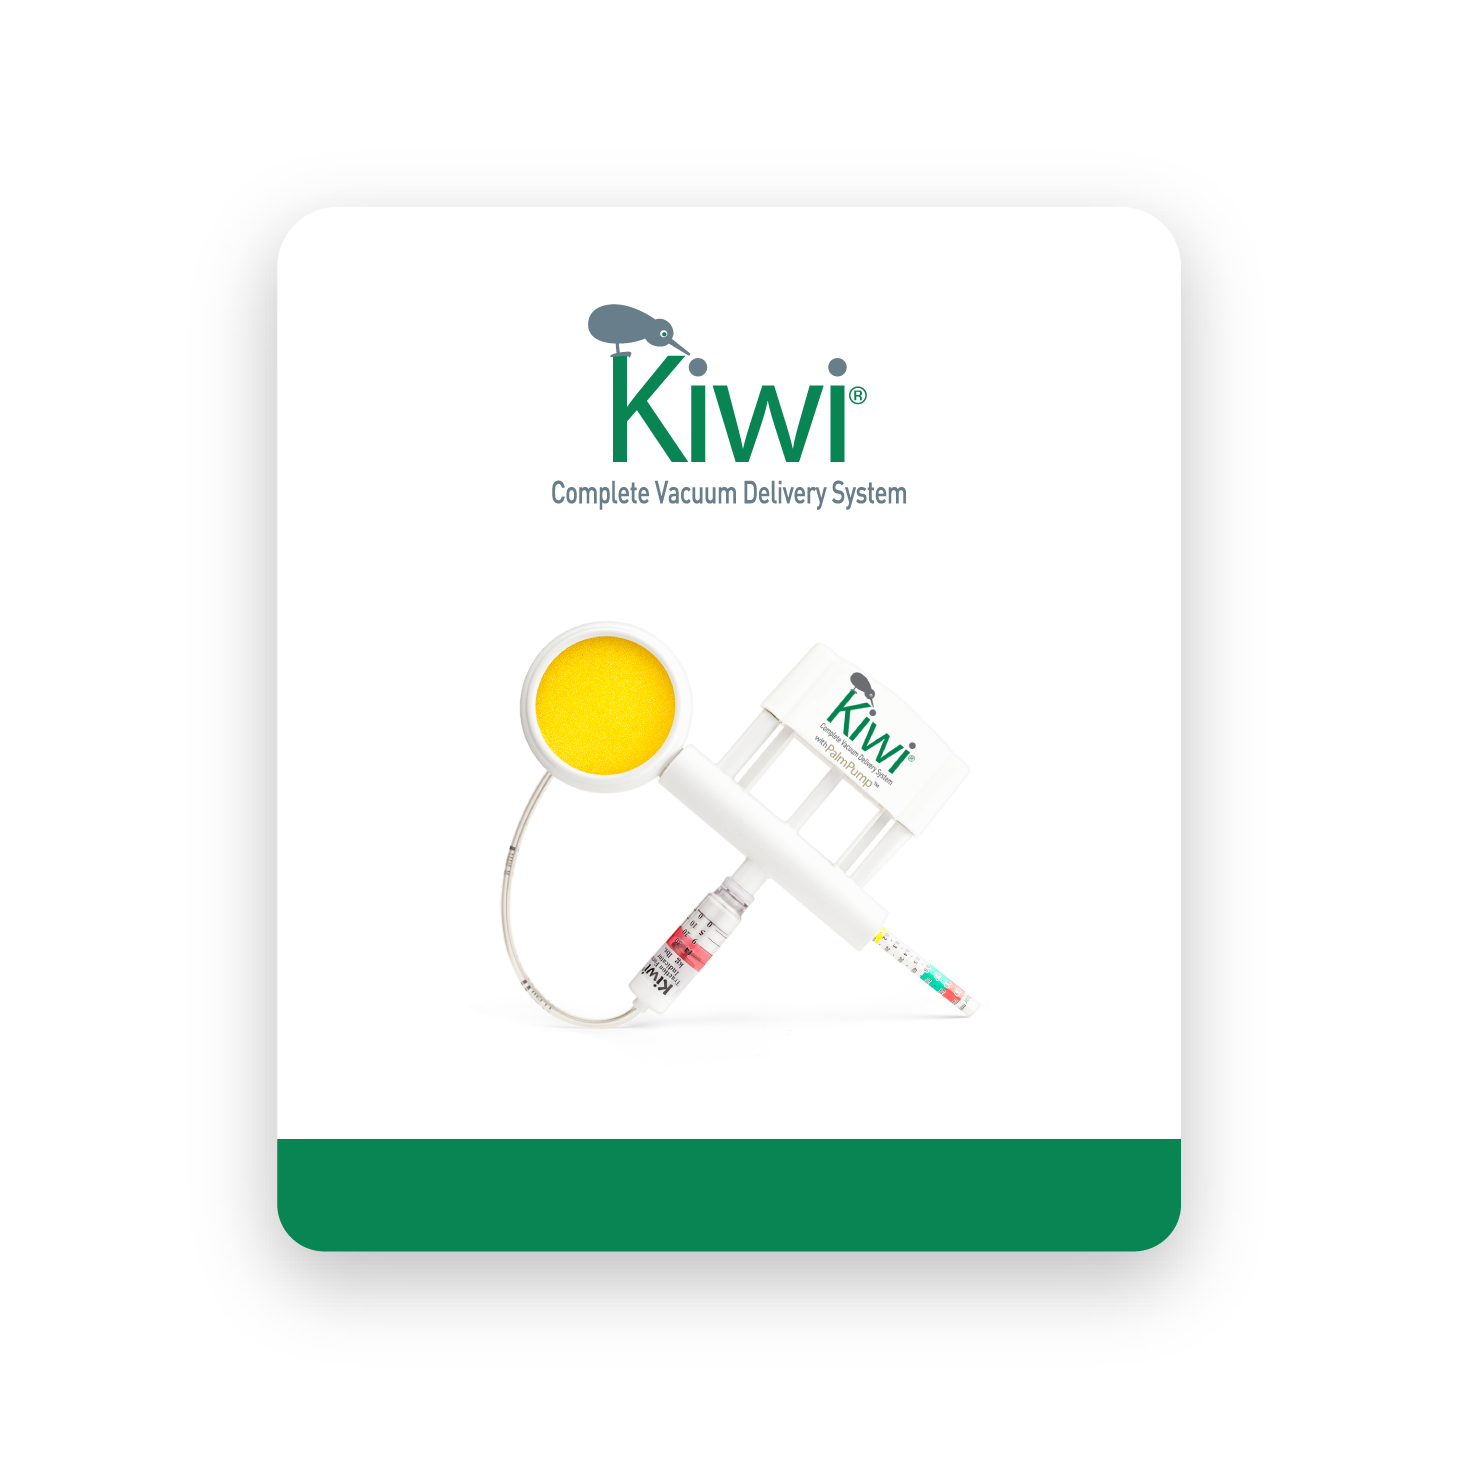 Kiwi Vacuum Delivery System Logo - Australia Site